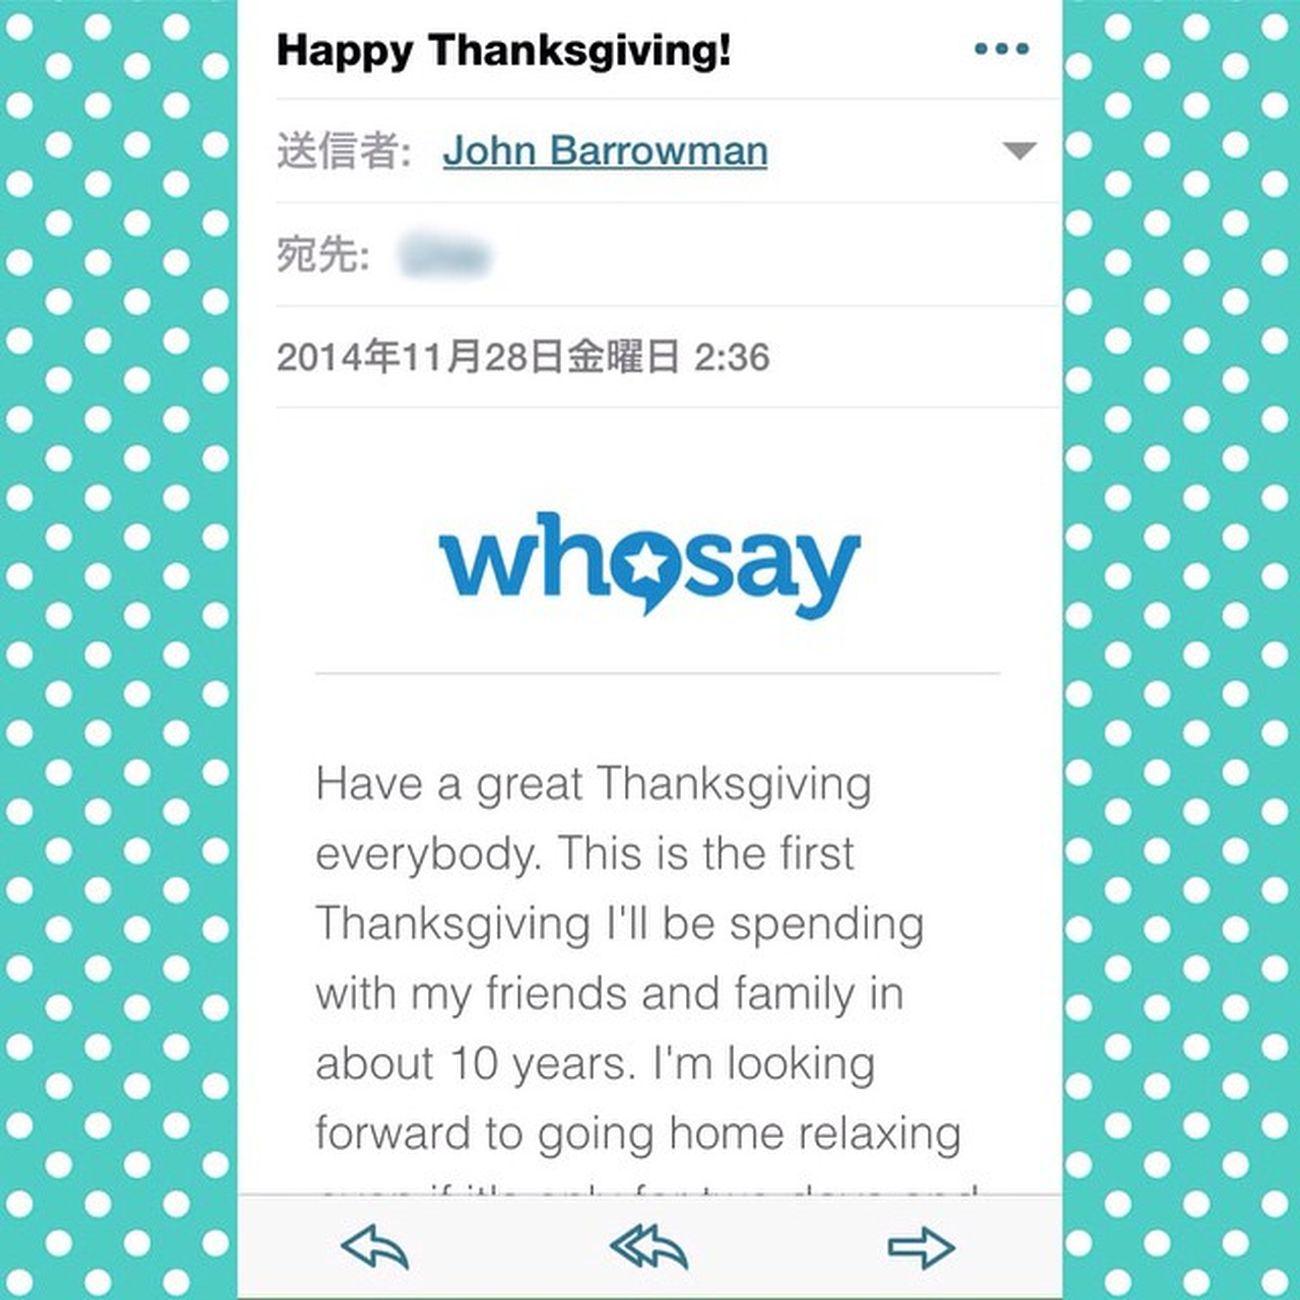 Thanksgiving Mail Thanksgivingday 感謝祭 ジョンバロウマン Johnbarrowman メール Whosay